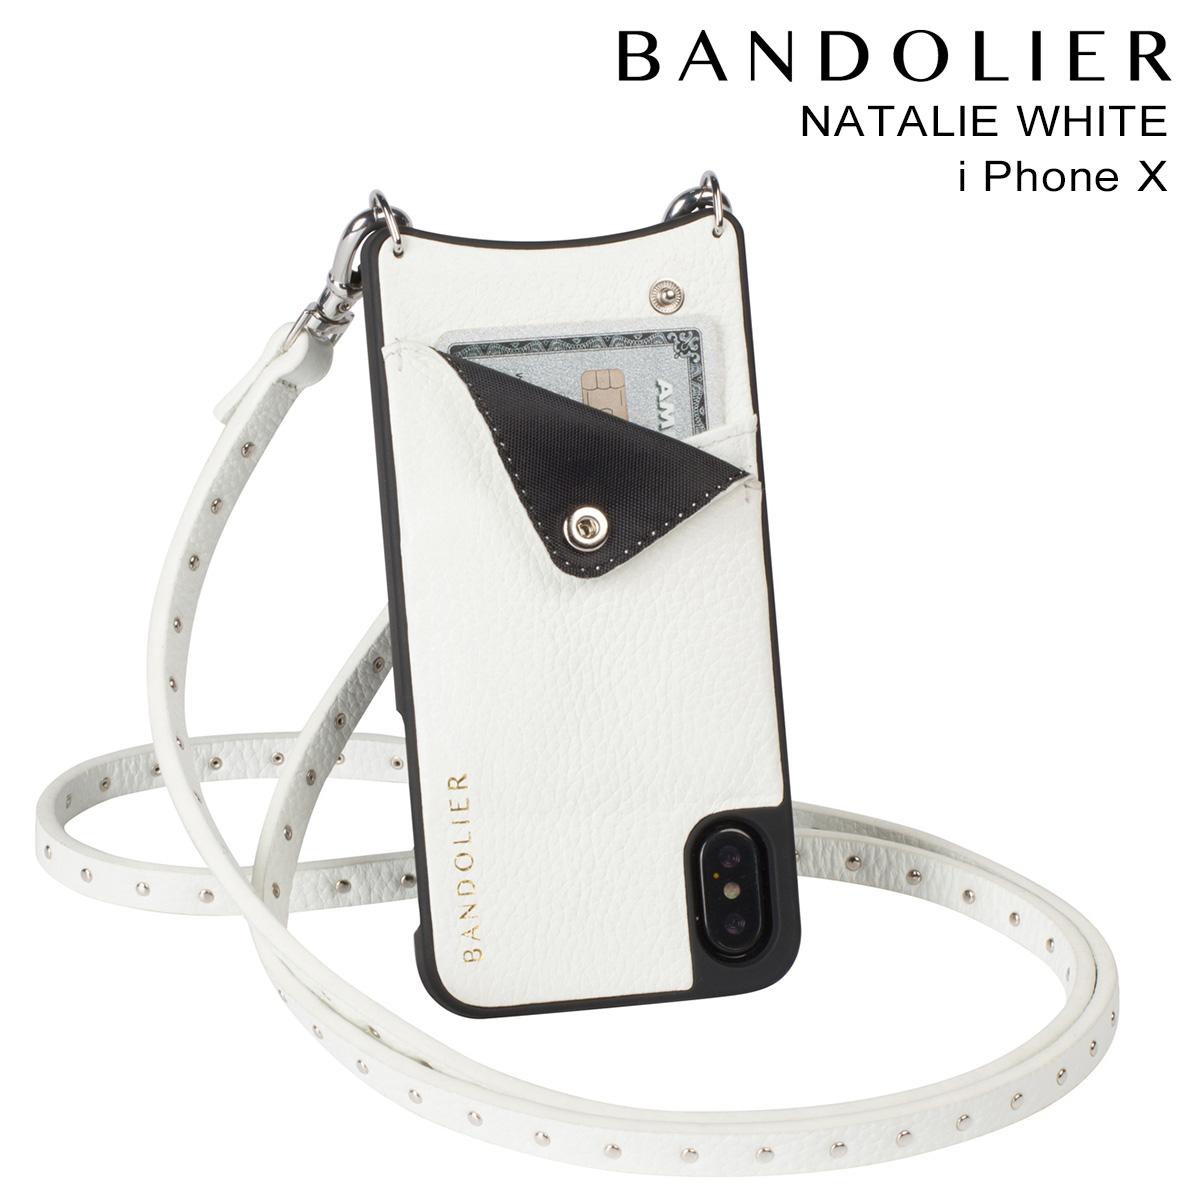 BANDOLIER NATALIE WHITE バンドリヤー iPhoneX ケース スマホ アイフォン レザー メンズ レディース [9/14 追加入荷]